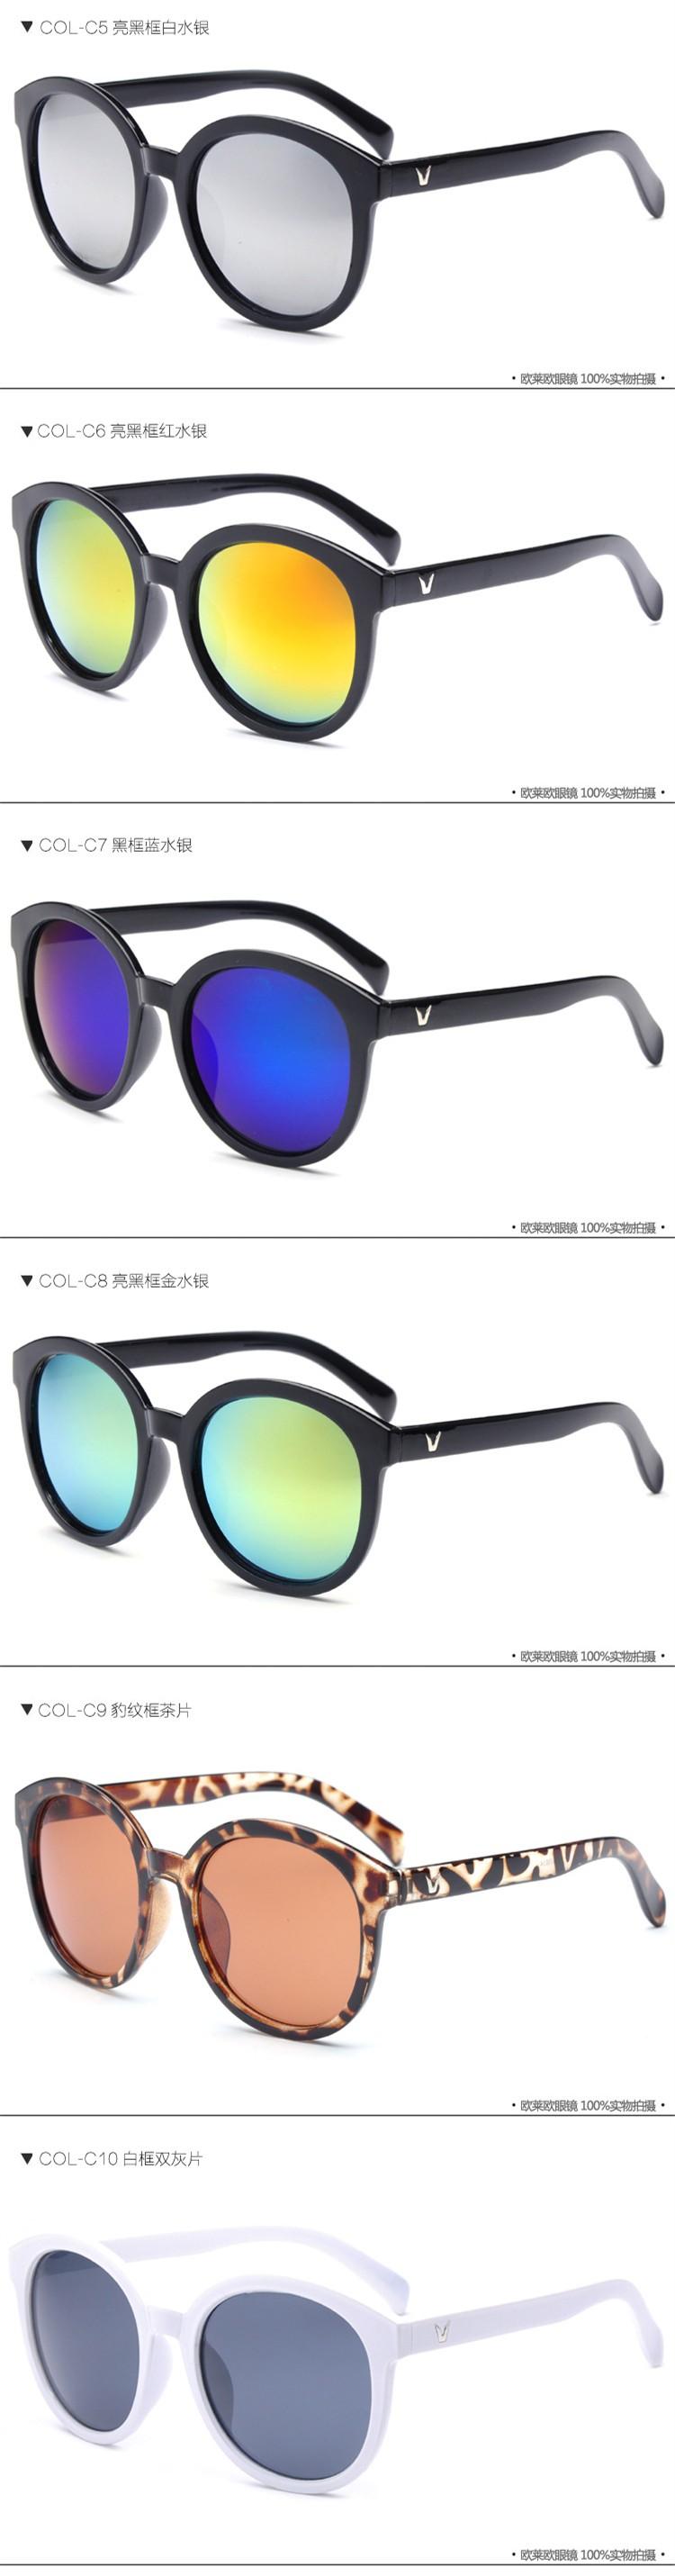 de611dc3bc3c Fashion REFLECTED Round Women Sunglasses Female Superstar Vintage Original Brand  Designer Metal Frame Celebrity Sun Glasses UVUSD 7.99 piece. 33. 44